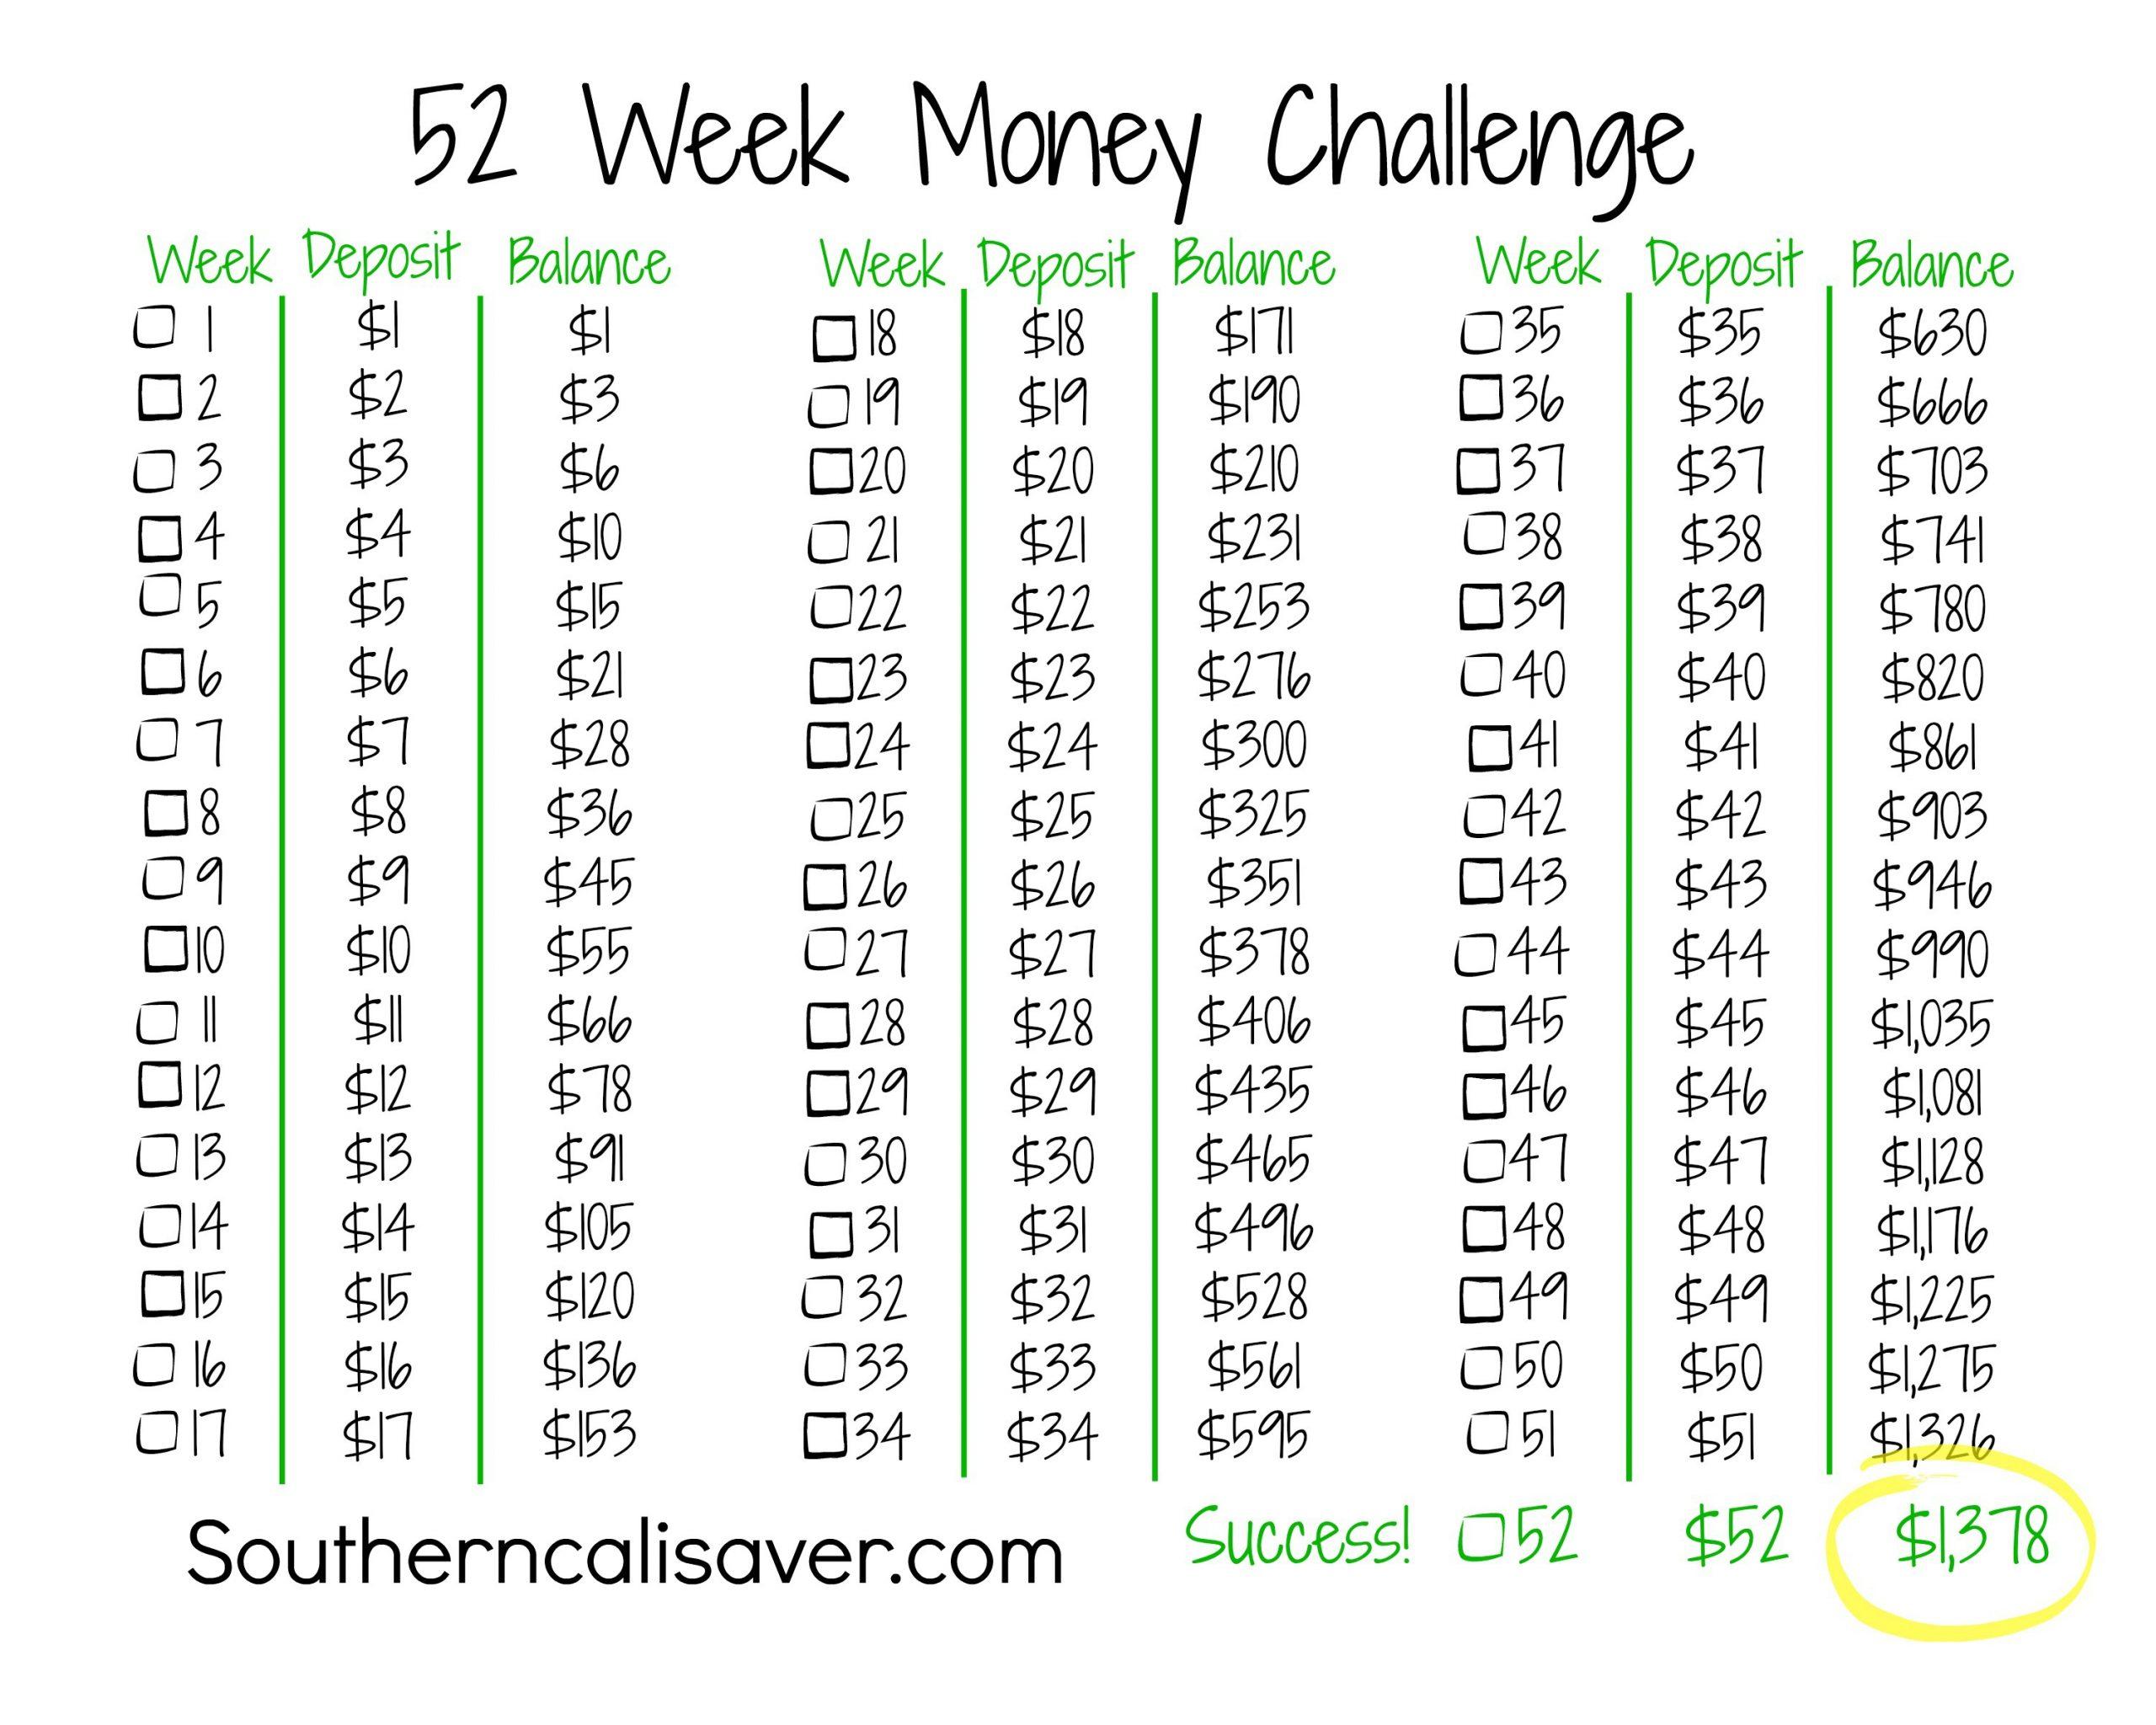 5 Different Ways To Save $1,400 Doing The 52 Week Savings Regarding 2022 Month Calendar 52 Week Challenge